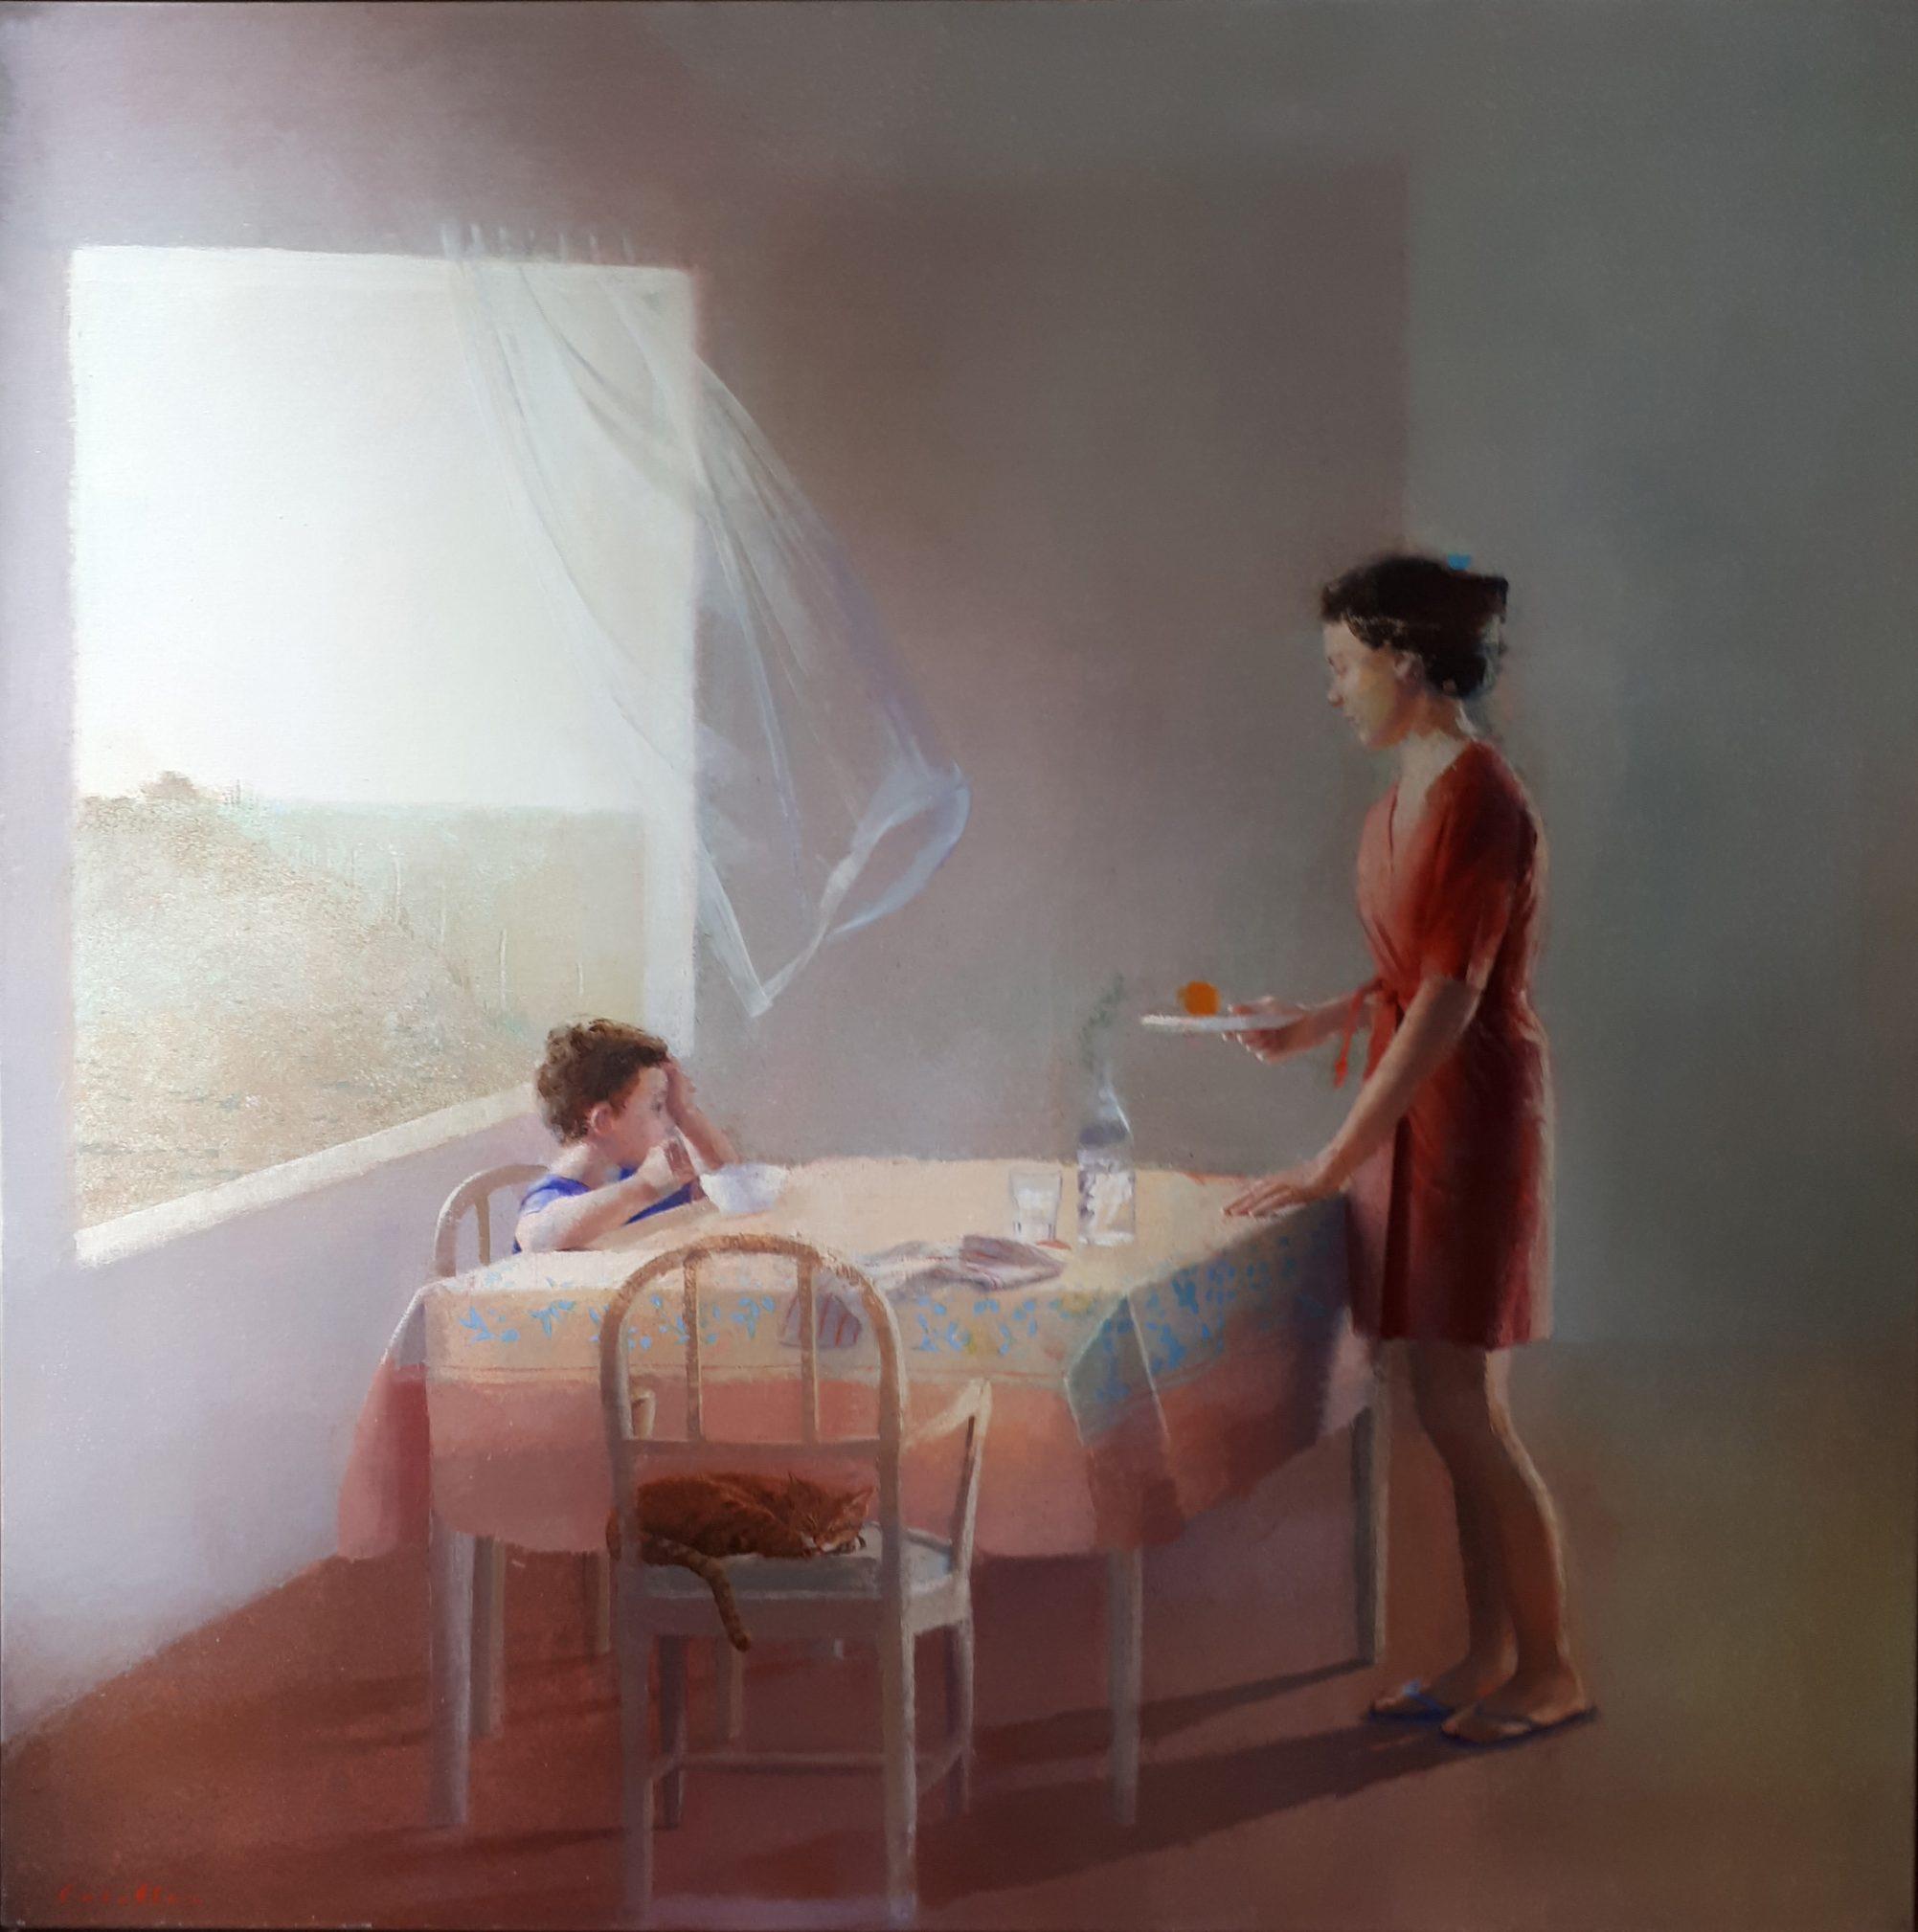 tramontana-alejandra-caballero-oleo-interior-madre-hijo-desayuno-mesa-gato-cortina-viento-andrew-wieth